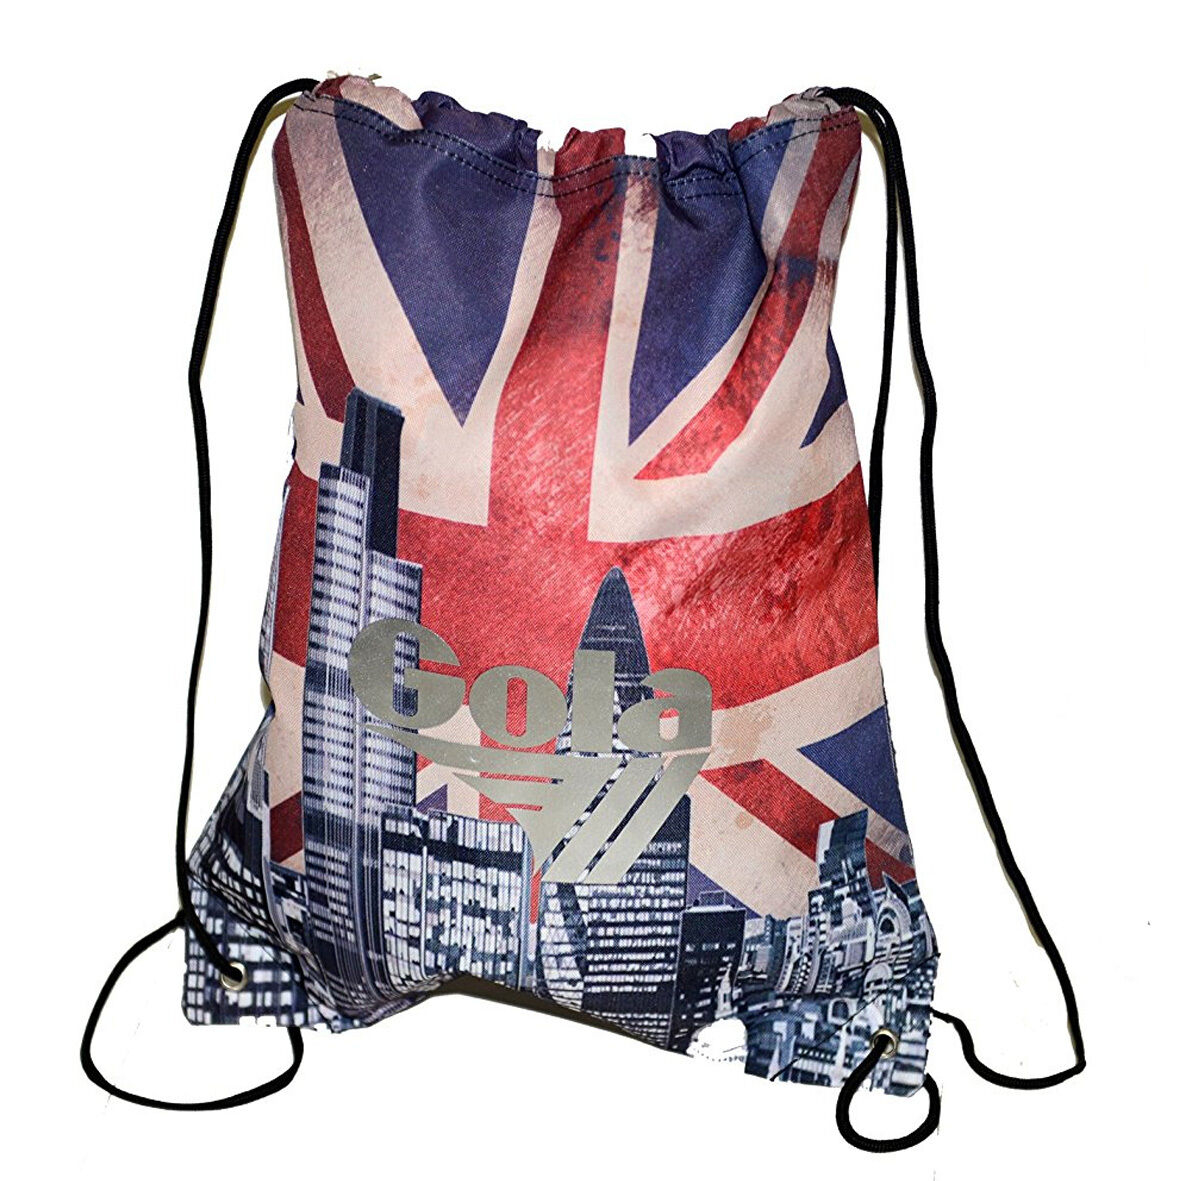 GOLA Sacca zaino coulisse in cordura pesante stampata skyline GRAN BRETAGNA UK